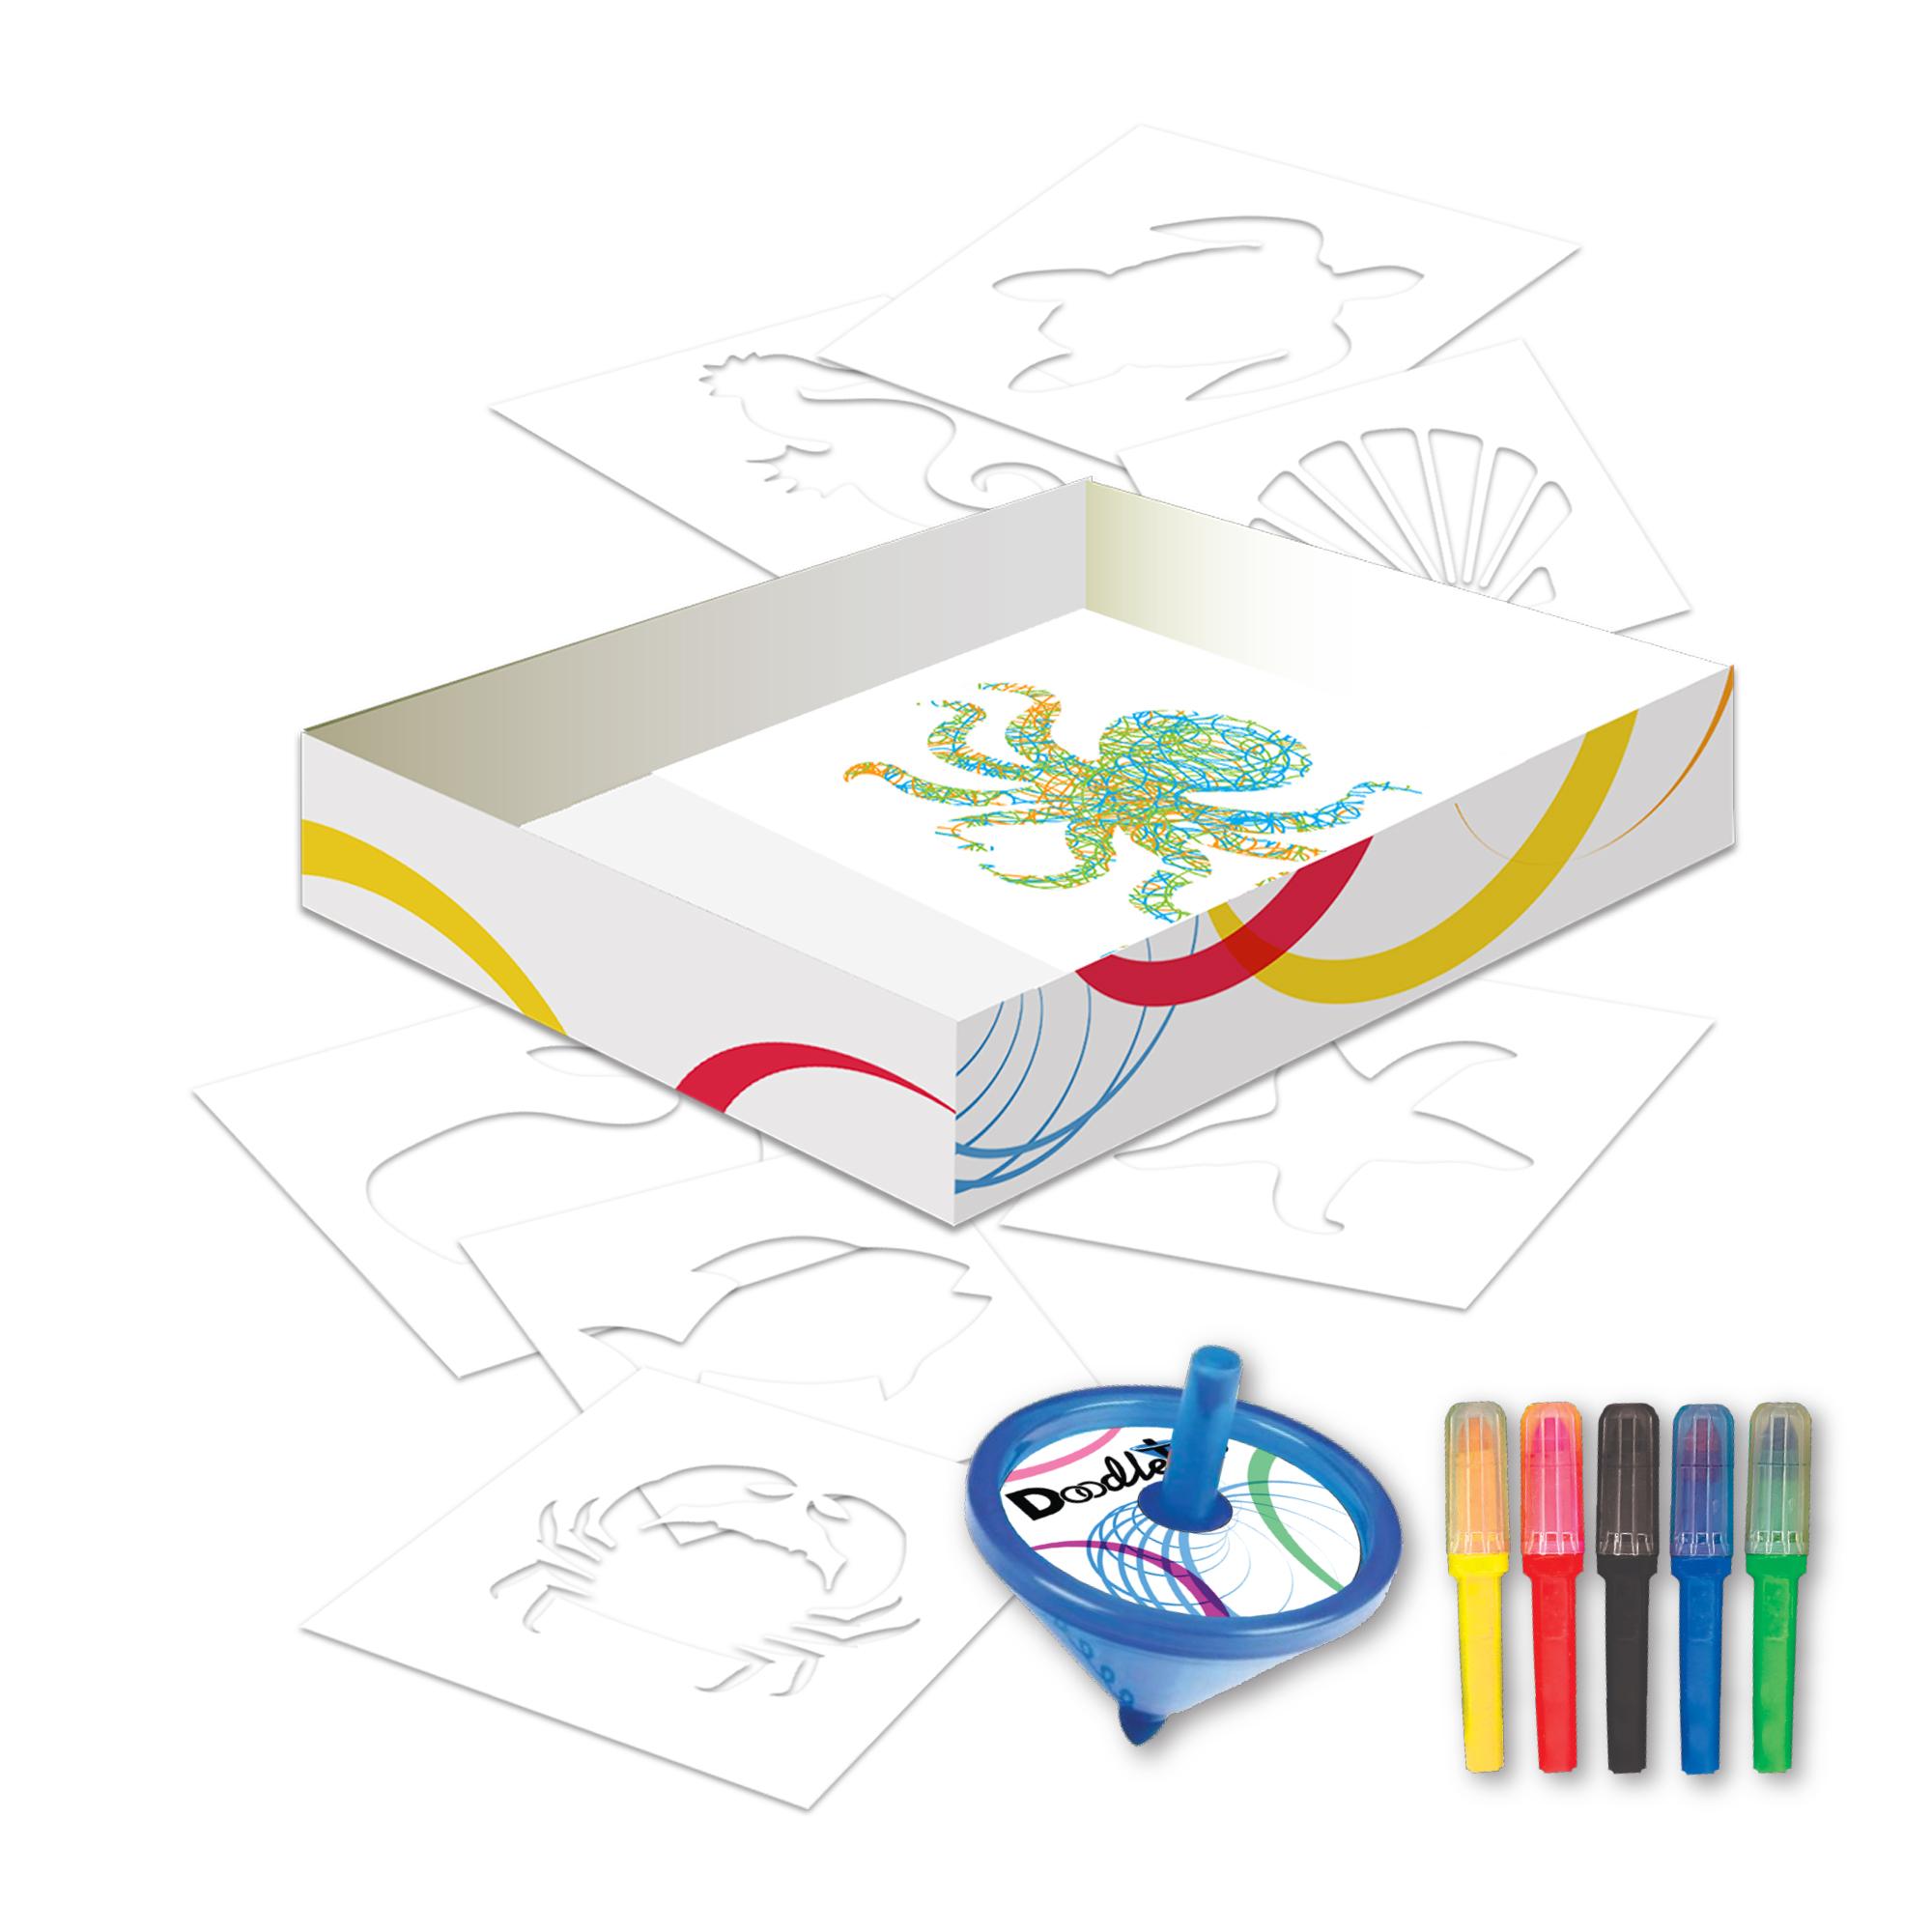 60608_DoodleTop-SeaLife-comps-beauty